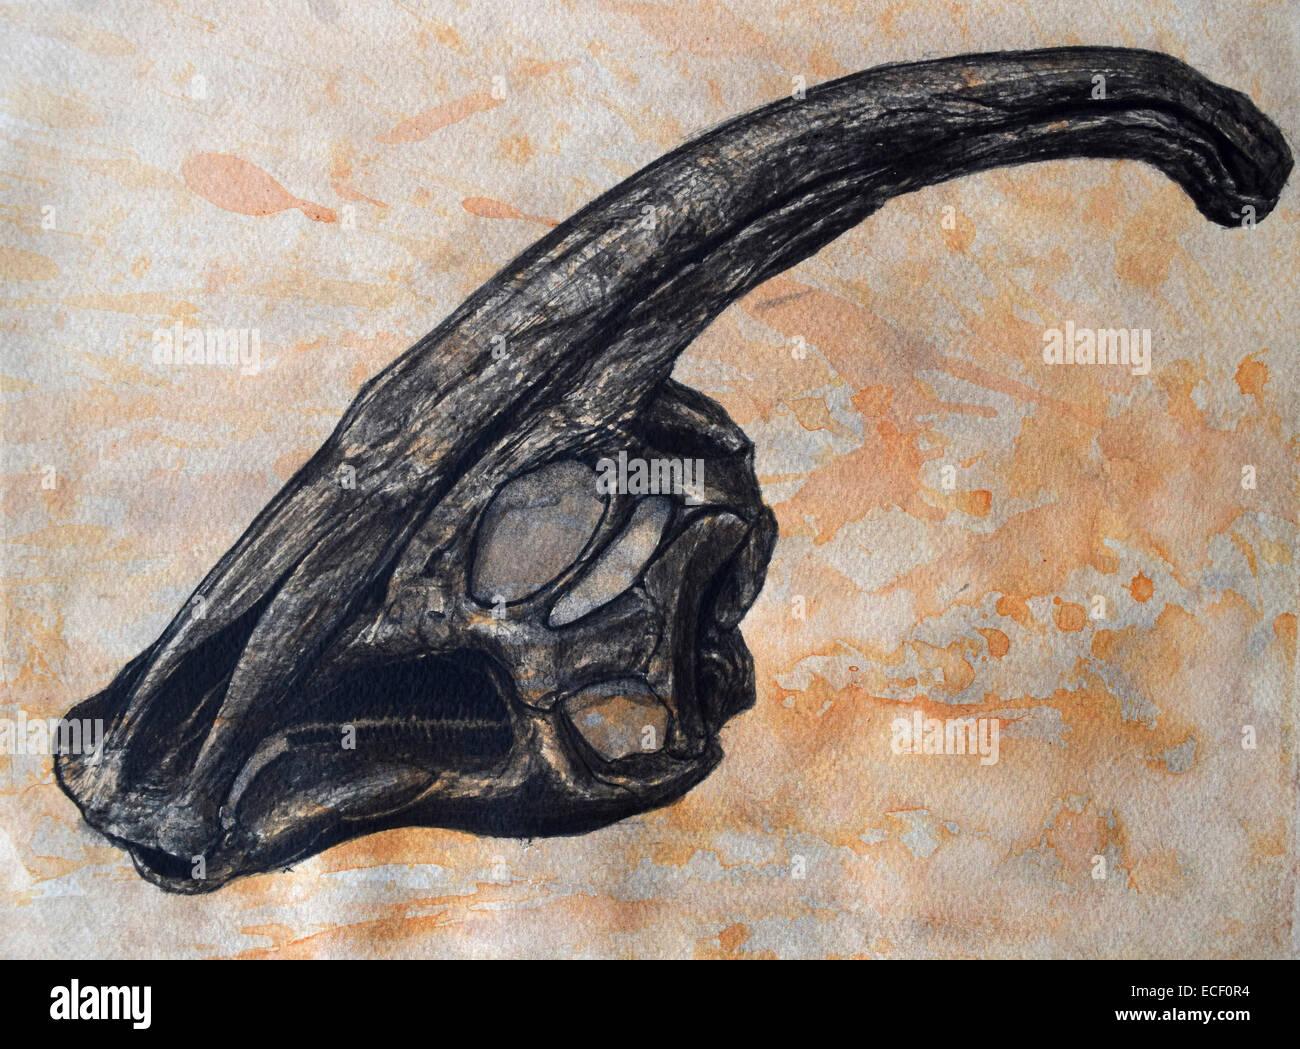 Parasaurolophus walkerii dinosaur skull on textured background. - Stock Image